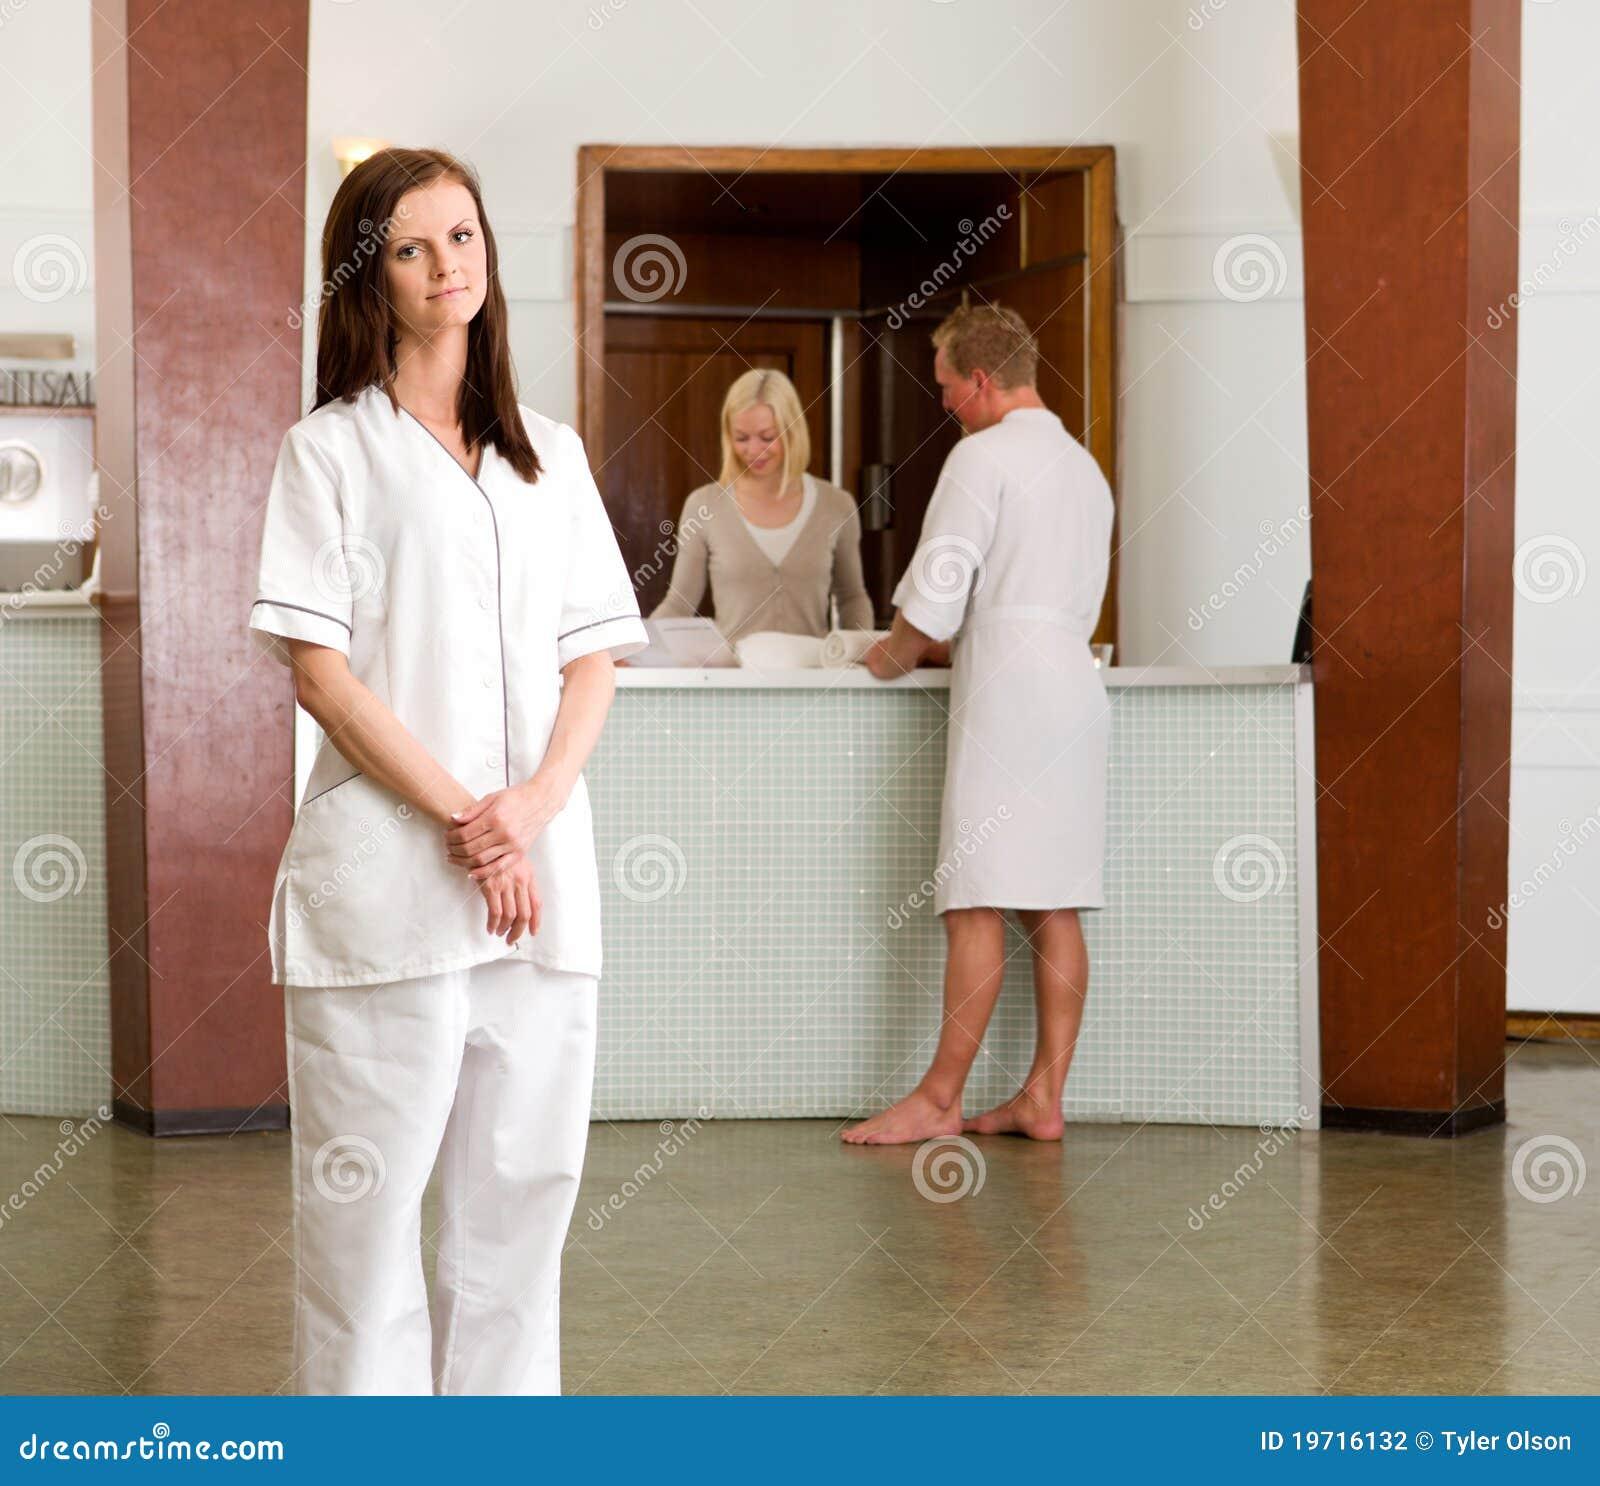 Spa therapist portrait stock photo image of profession for Spa employee uniform